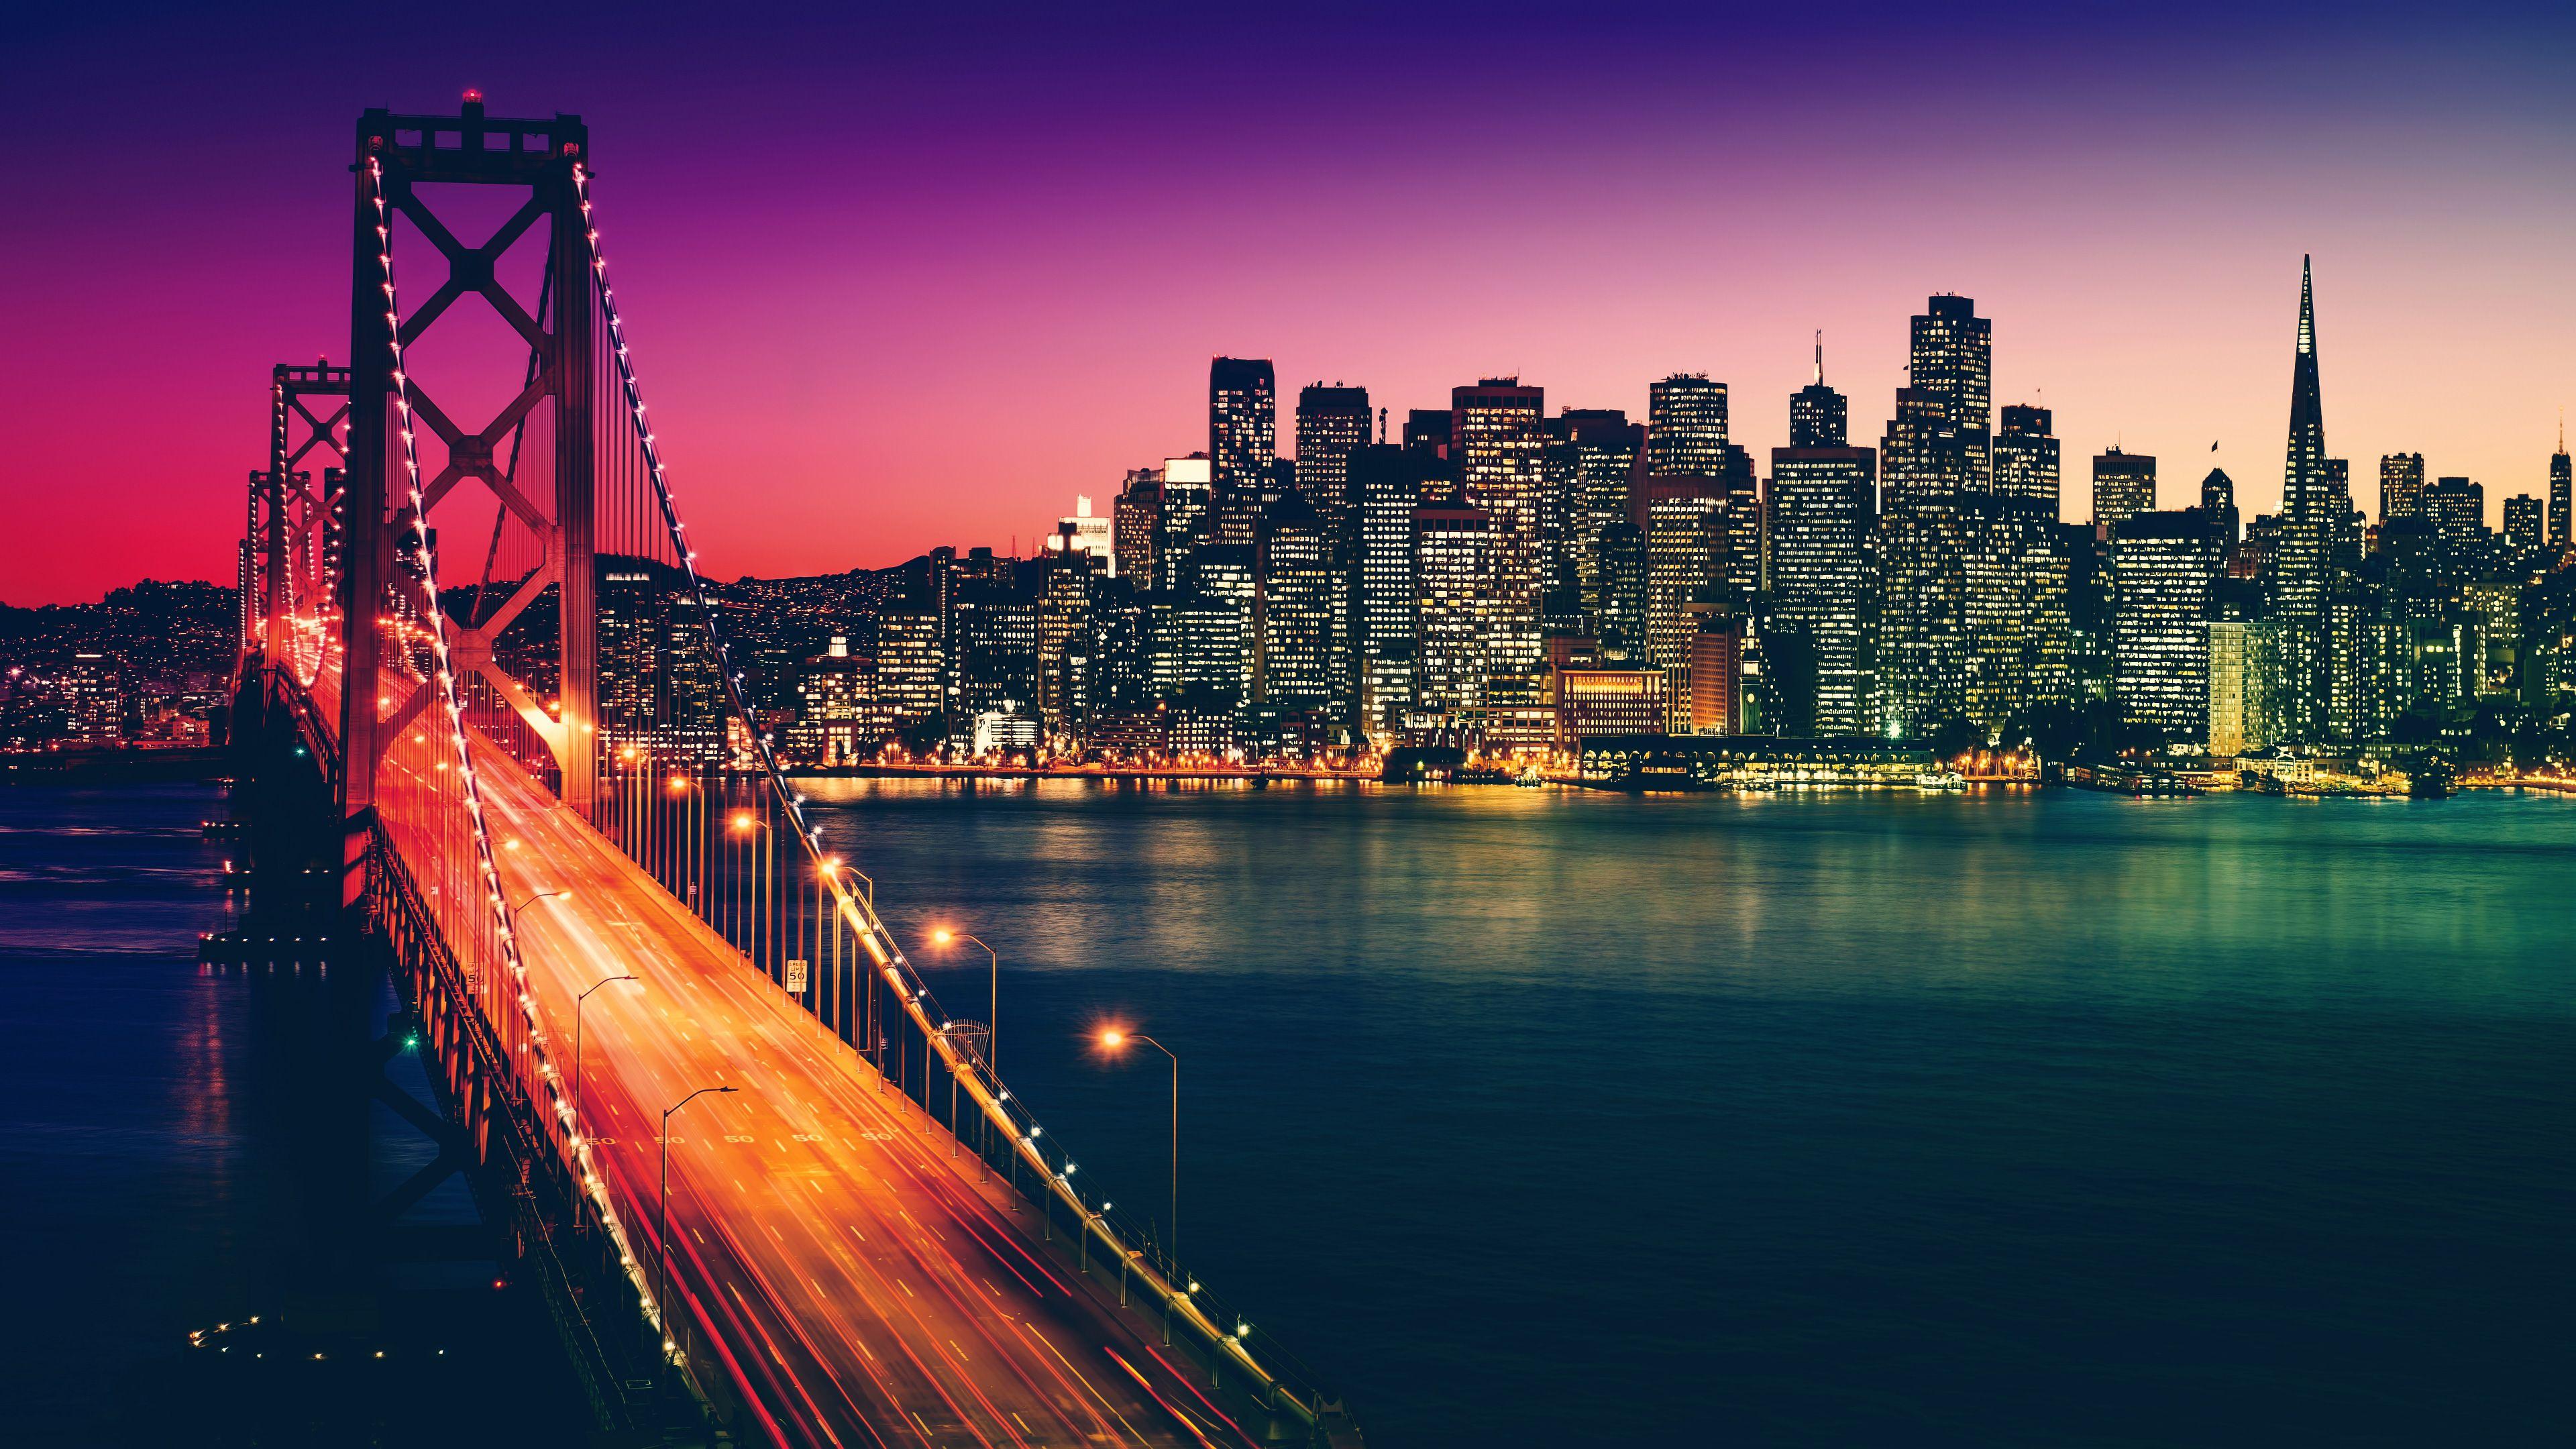 San Francisco 4k Wallpapers Wallpaper Cave